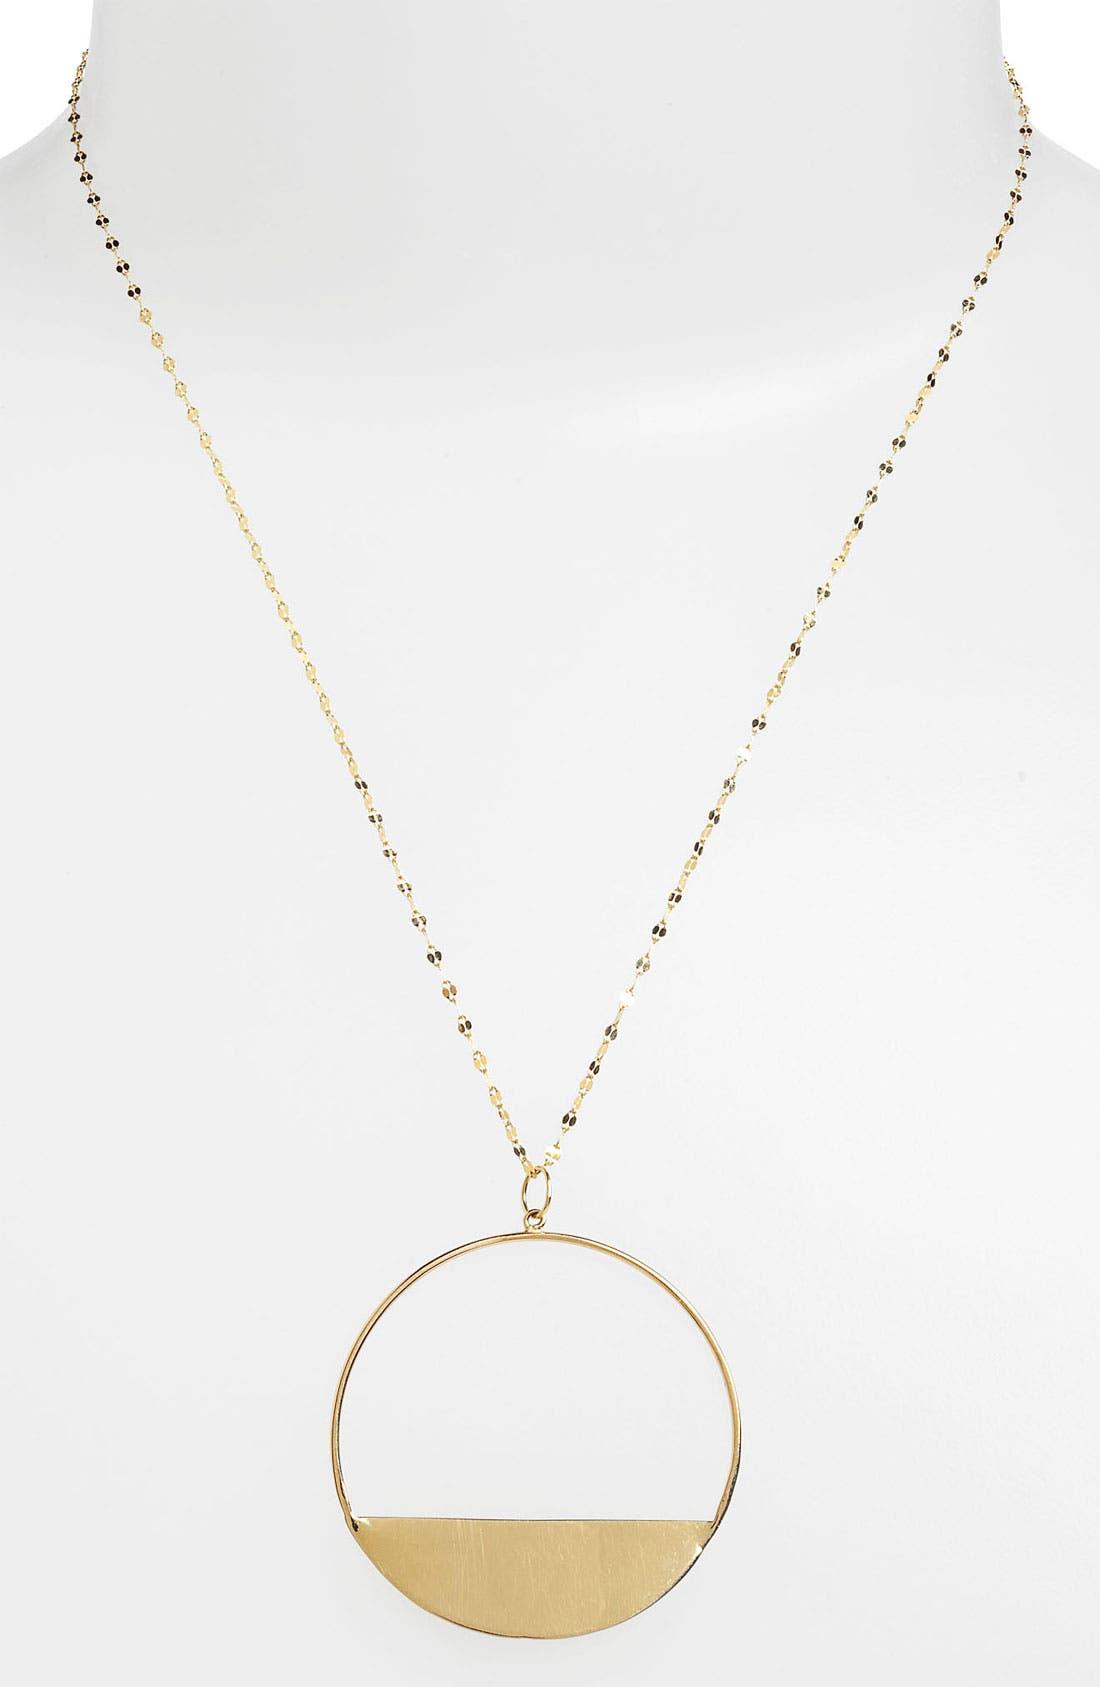 Alternate Image 1 Selected - Lana Jewelry Medium Eclipse Pendant Necklace